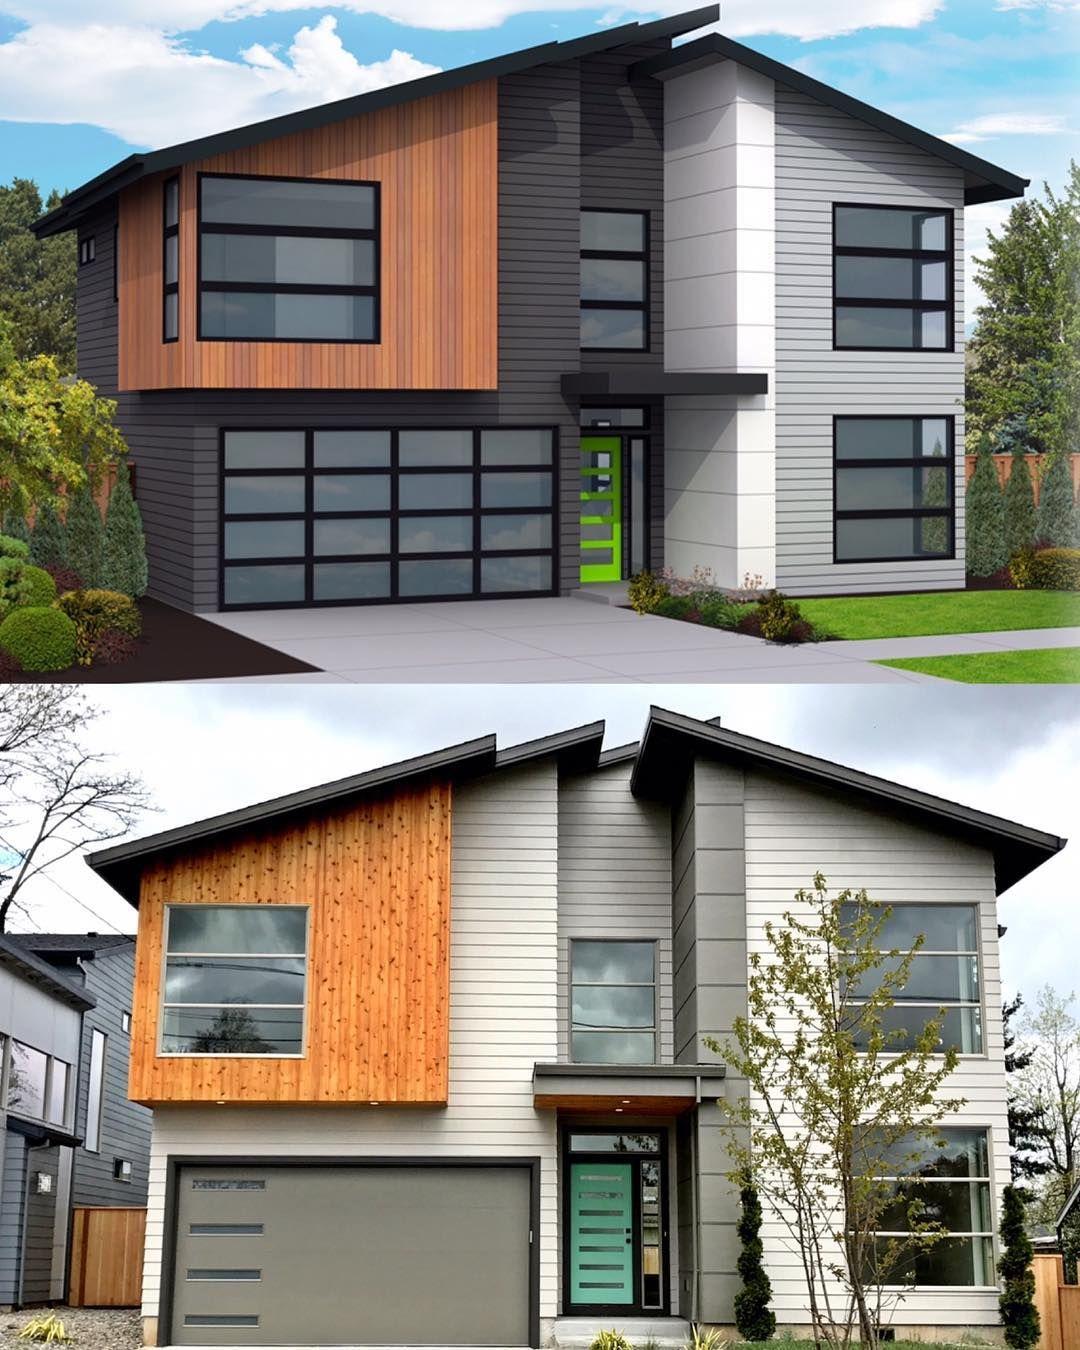 Interior Design Vs Architecture Reddit: Rendering Vs Reality. #homedesign #architecture